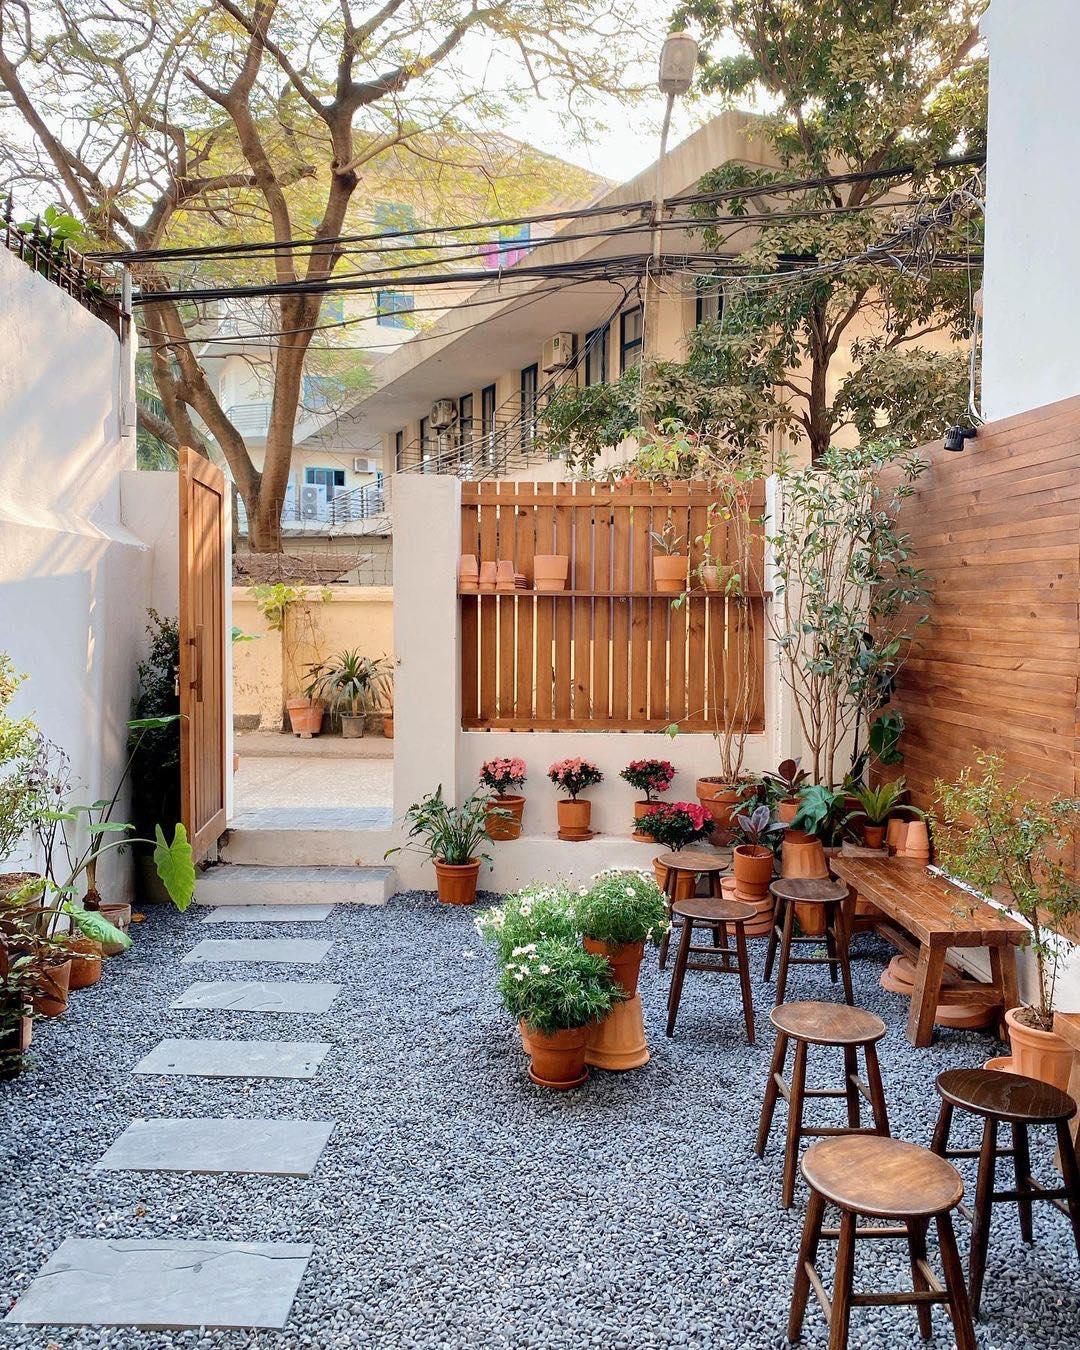 Hoon Cafe